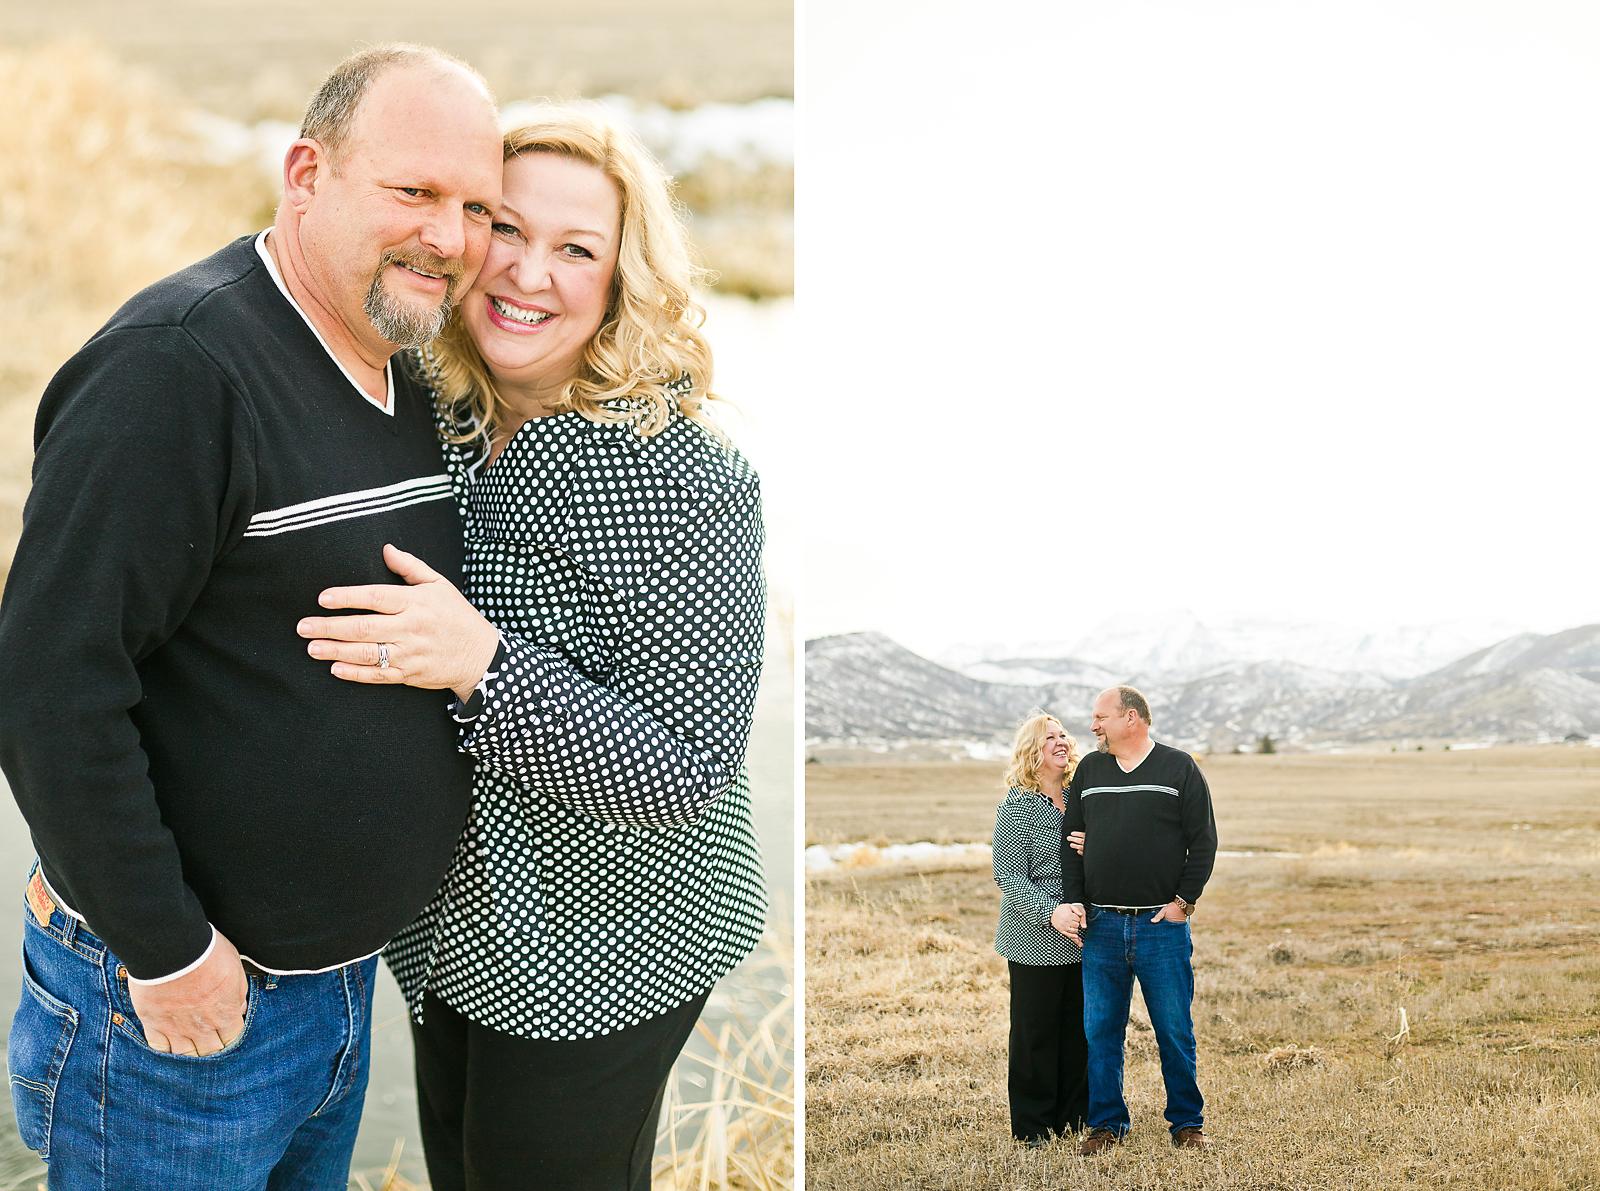 senior_couple_anniversary_pictures_007.jpg